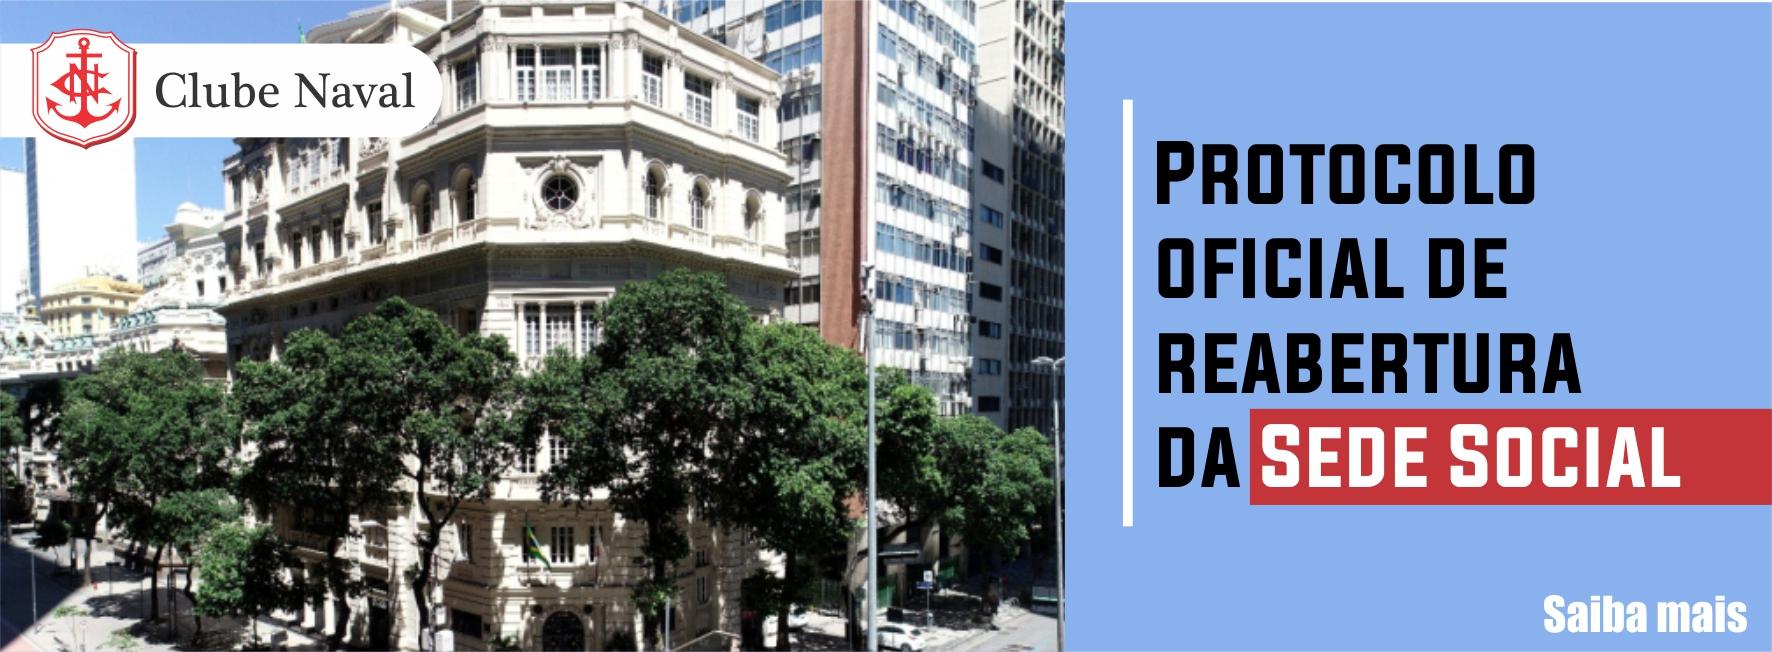 https://www.clubenaval.org.br/novo/?q=protocolo-de-reabertura-da-sede-social